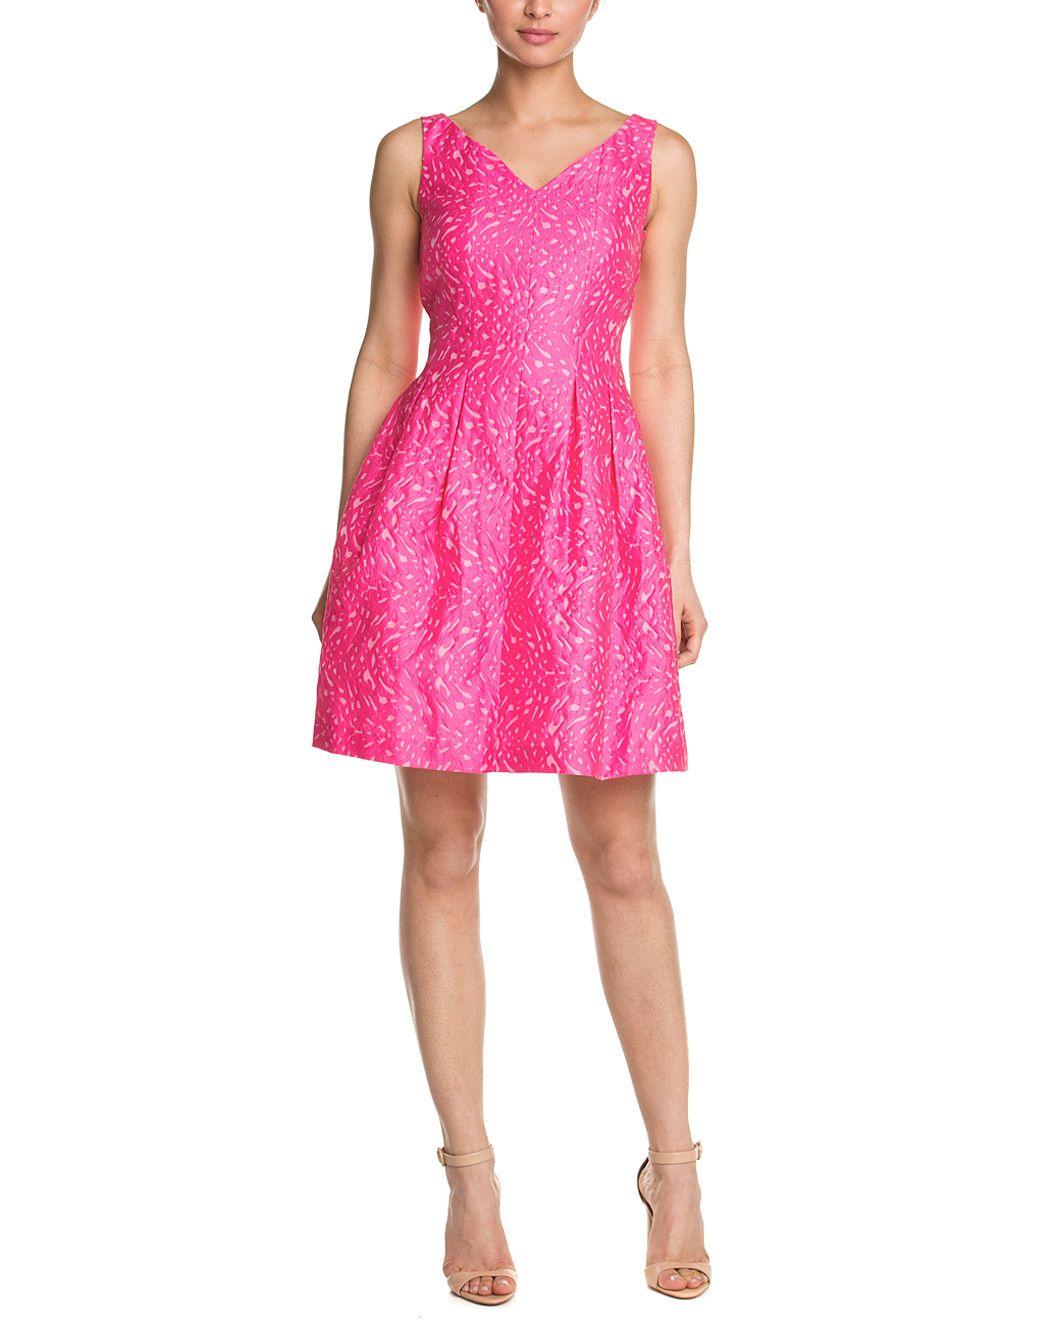 Rue La La Taylor Azalea Fit Flare Dress Dresses Fit Flare Dress Day Dresses [ 1320 x 1056 Pixel ]